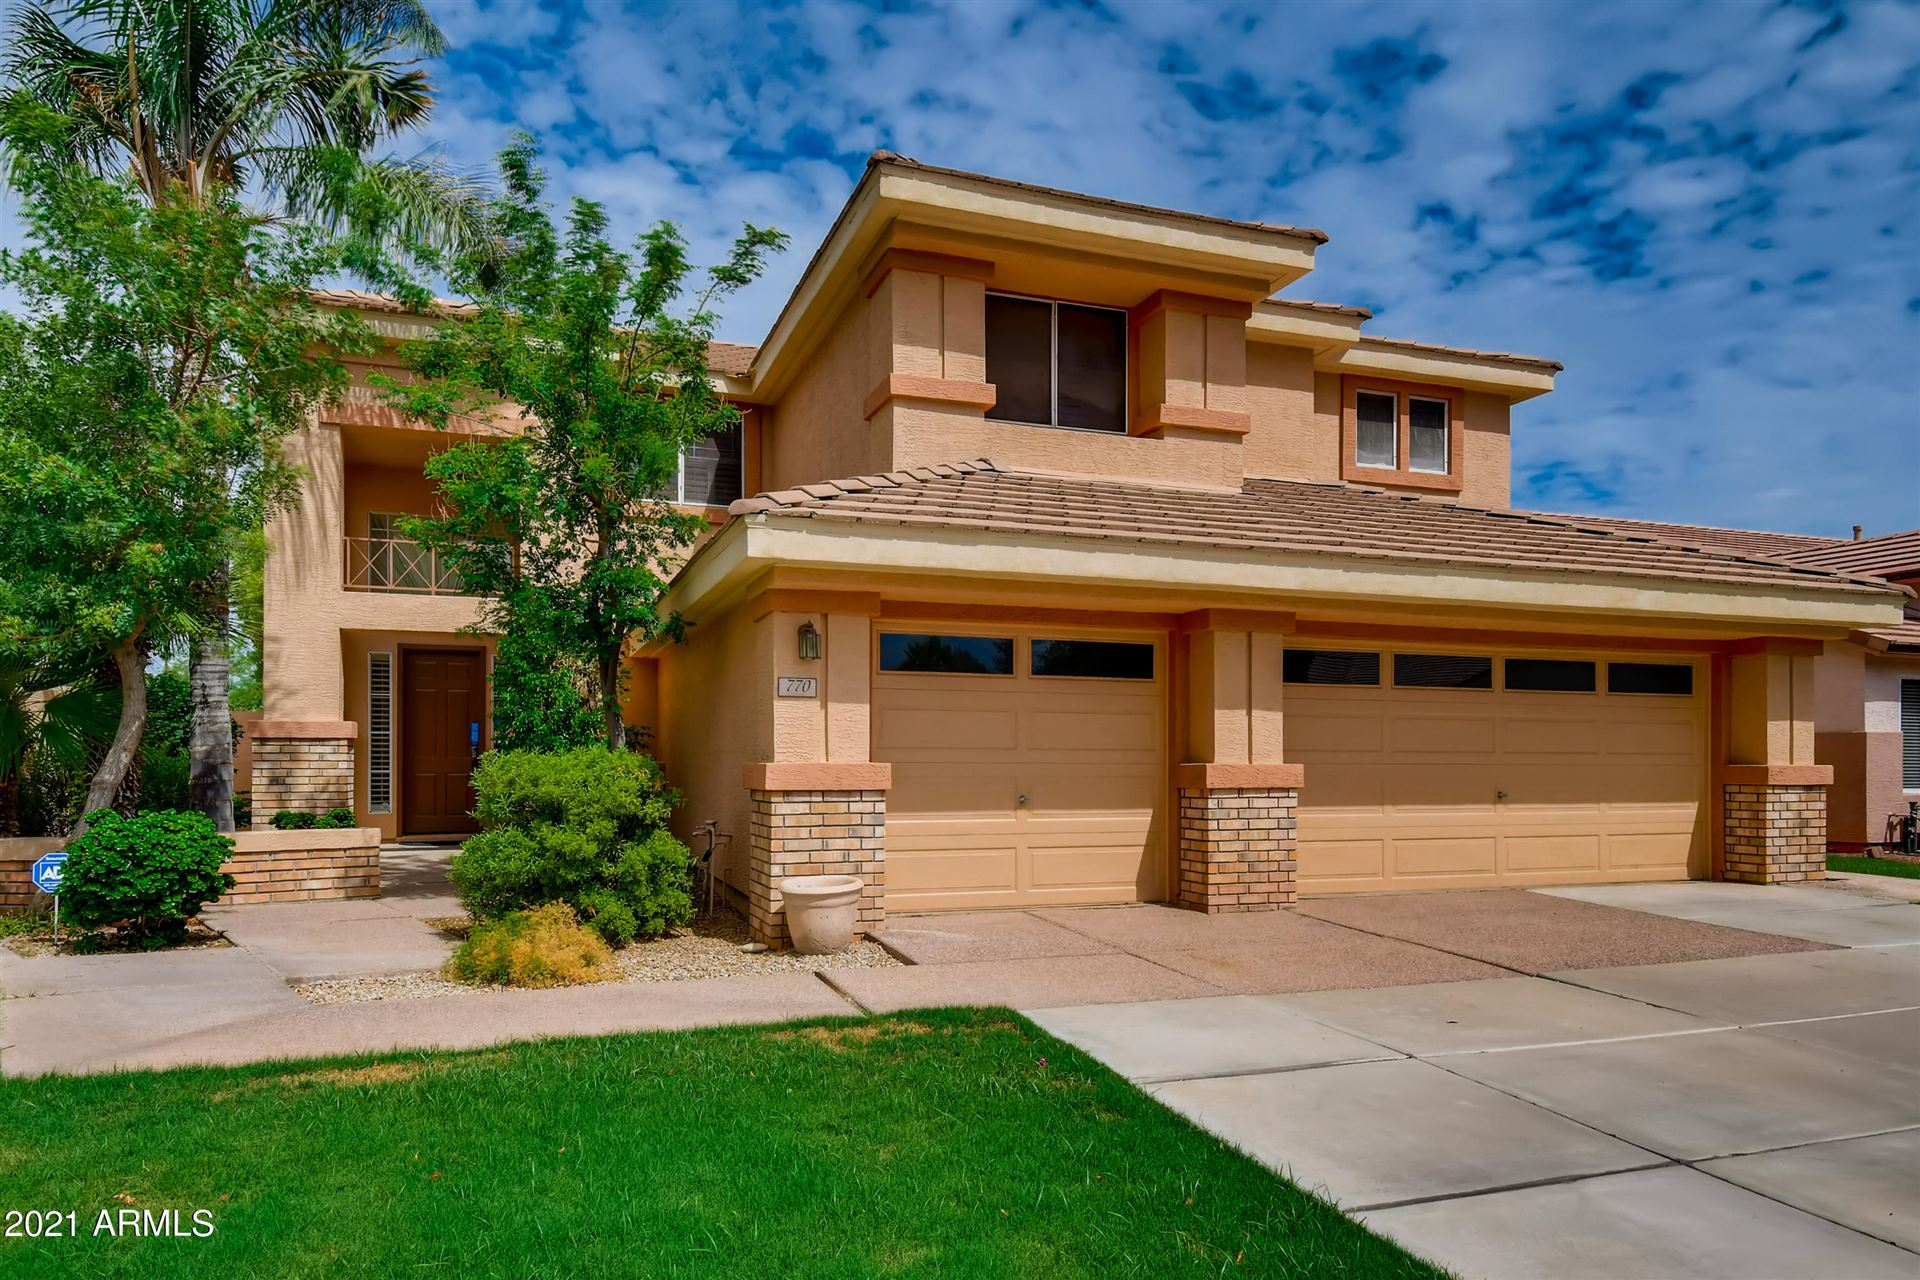 770 N NANTUCKET Street, Chandler, AZ 85225 - MLS#: 6265895